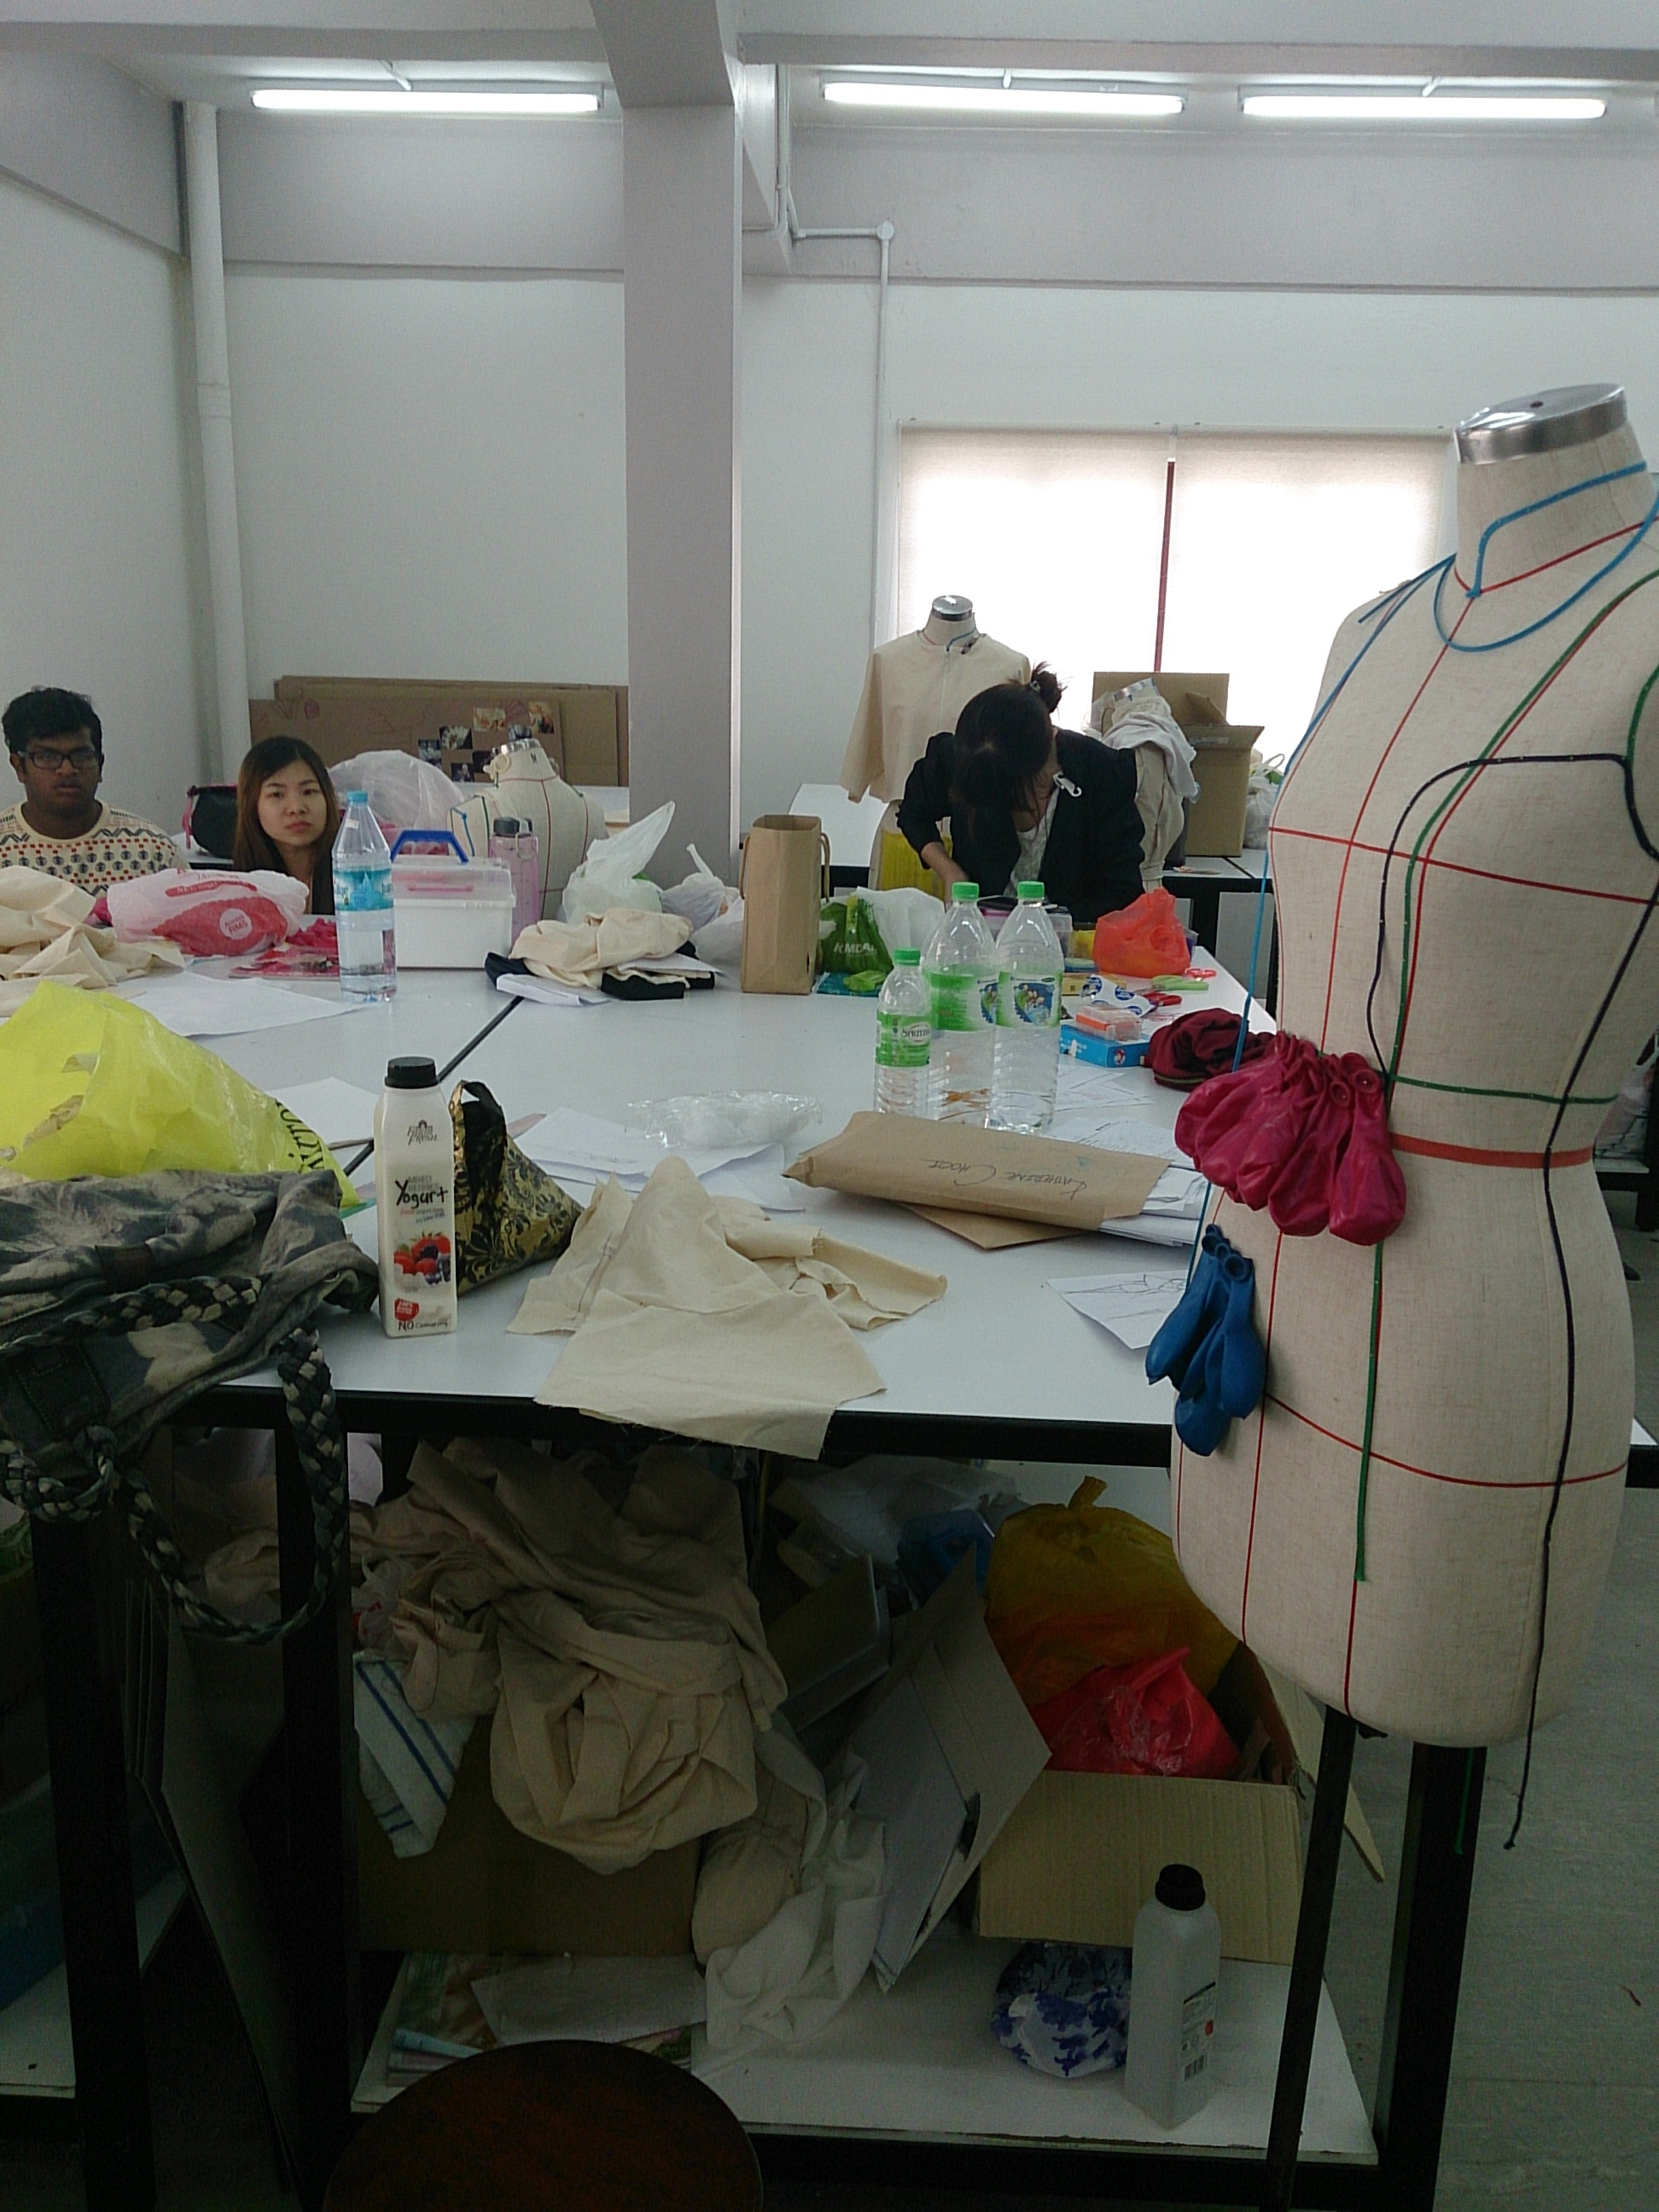 Fashion Design Studio At Saito College Eduspiral Represents Top Private Universities In Malaysia Best Advise Information On Courses At Malaysia S Top Private Universities And Colleges